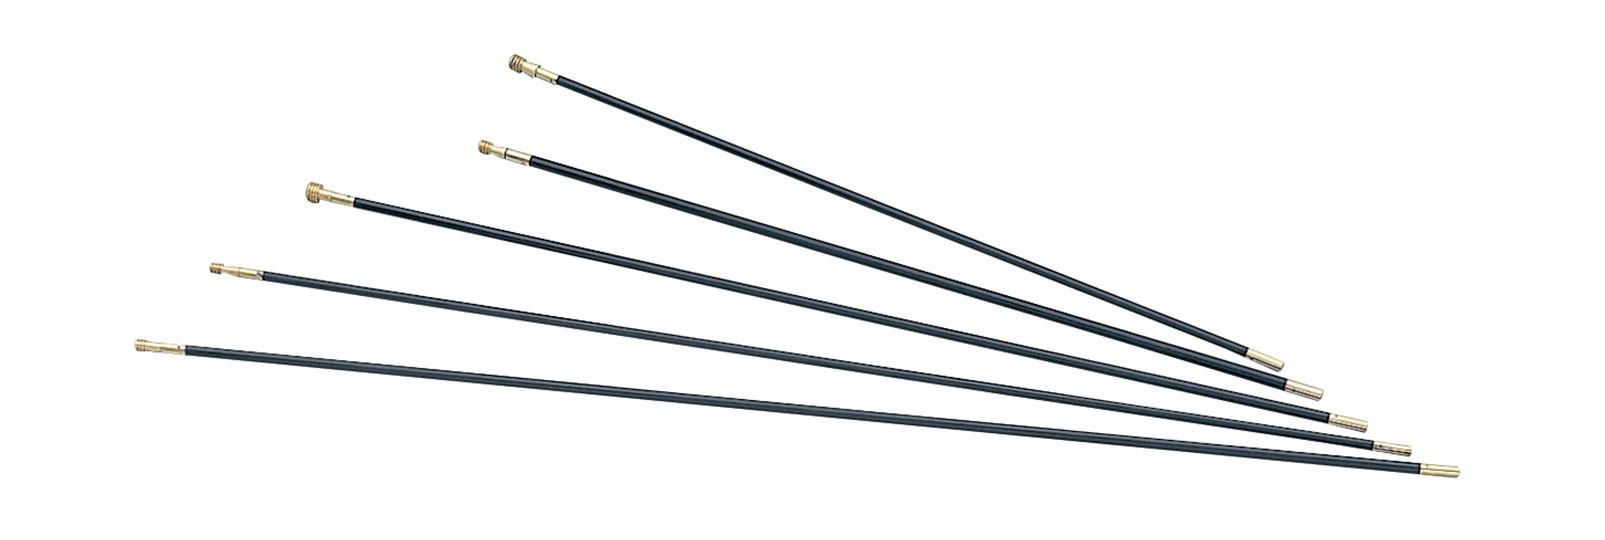 Shotgun fiber rod 9x685mm